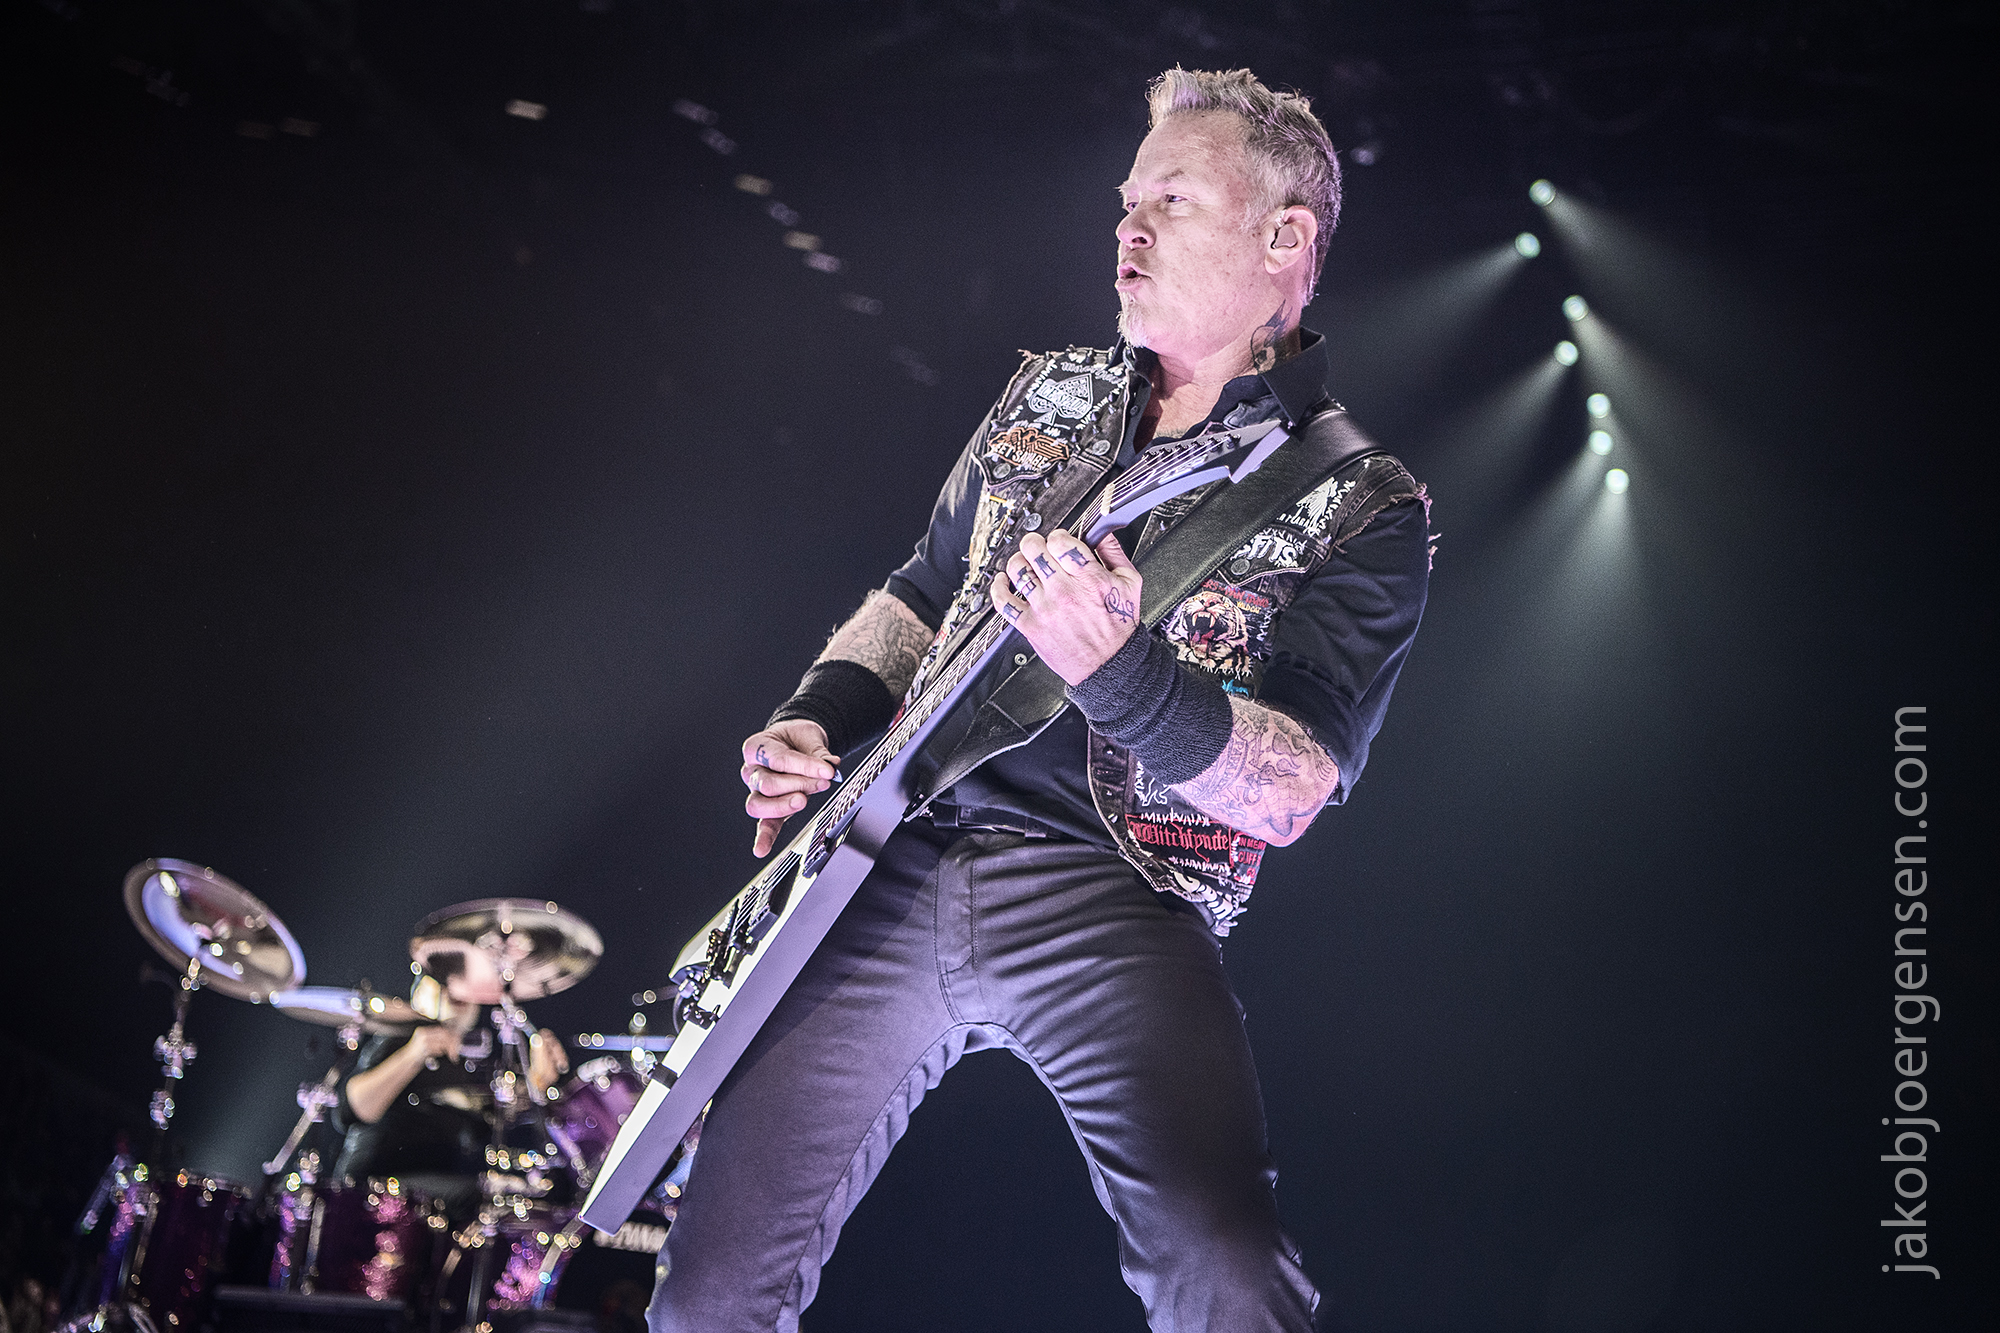 09-02-17_EB Metallica_0171.jpg